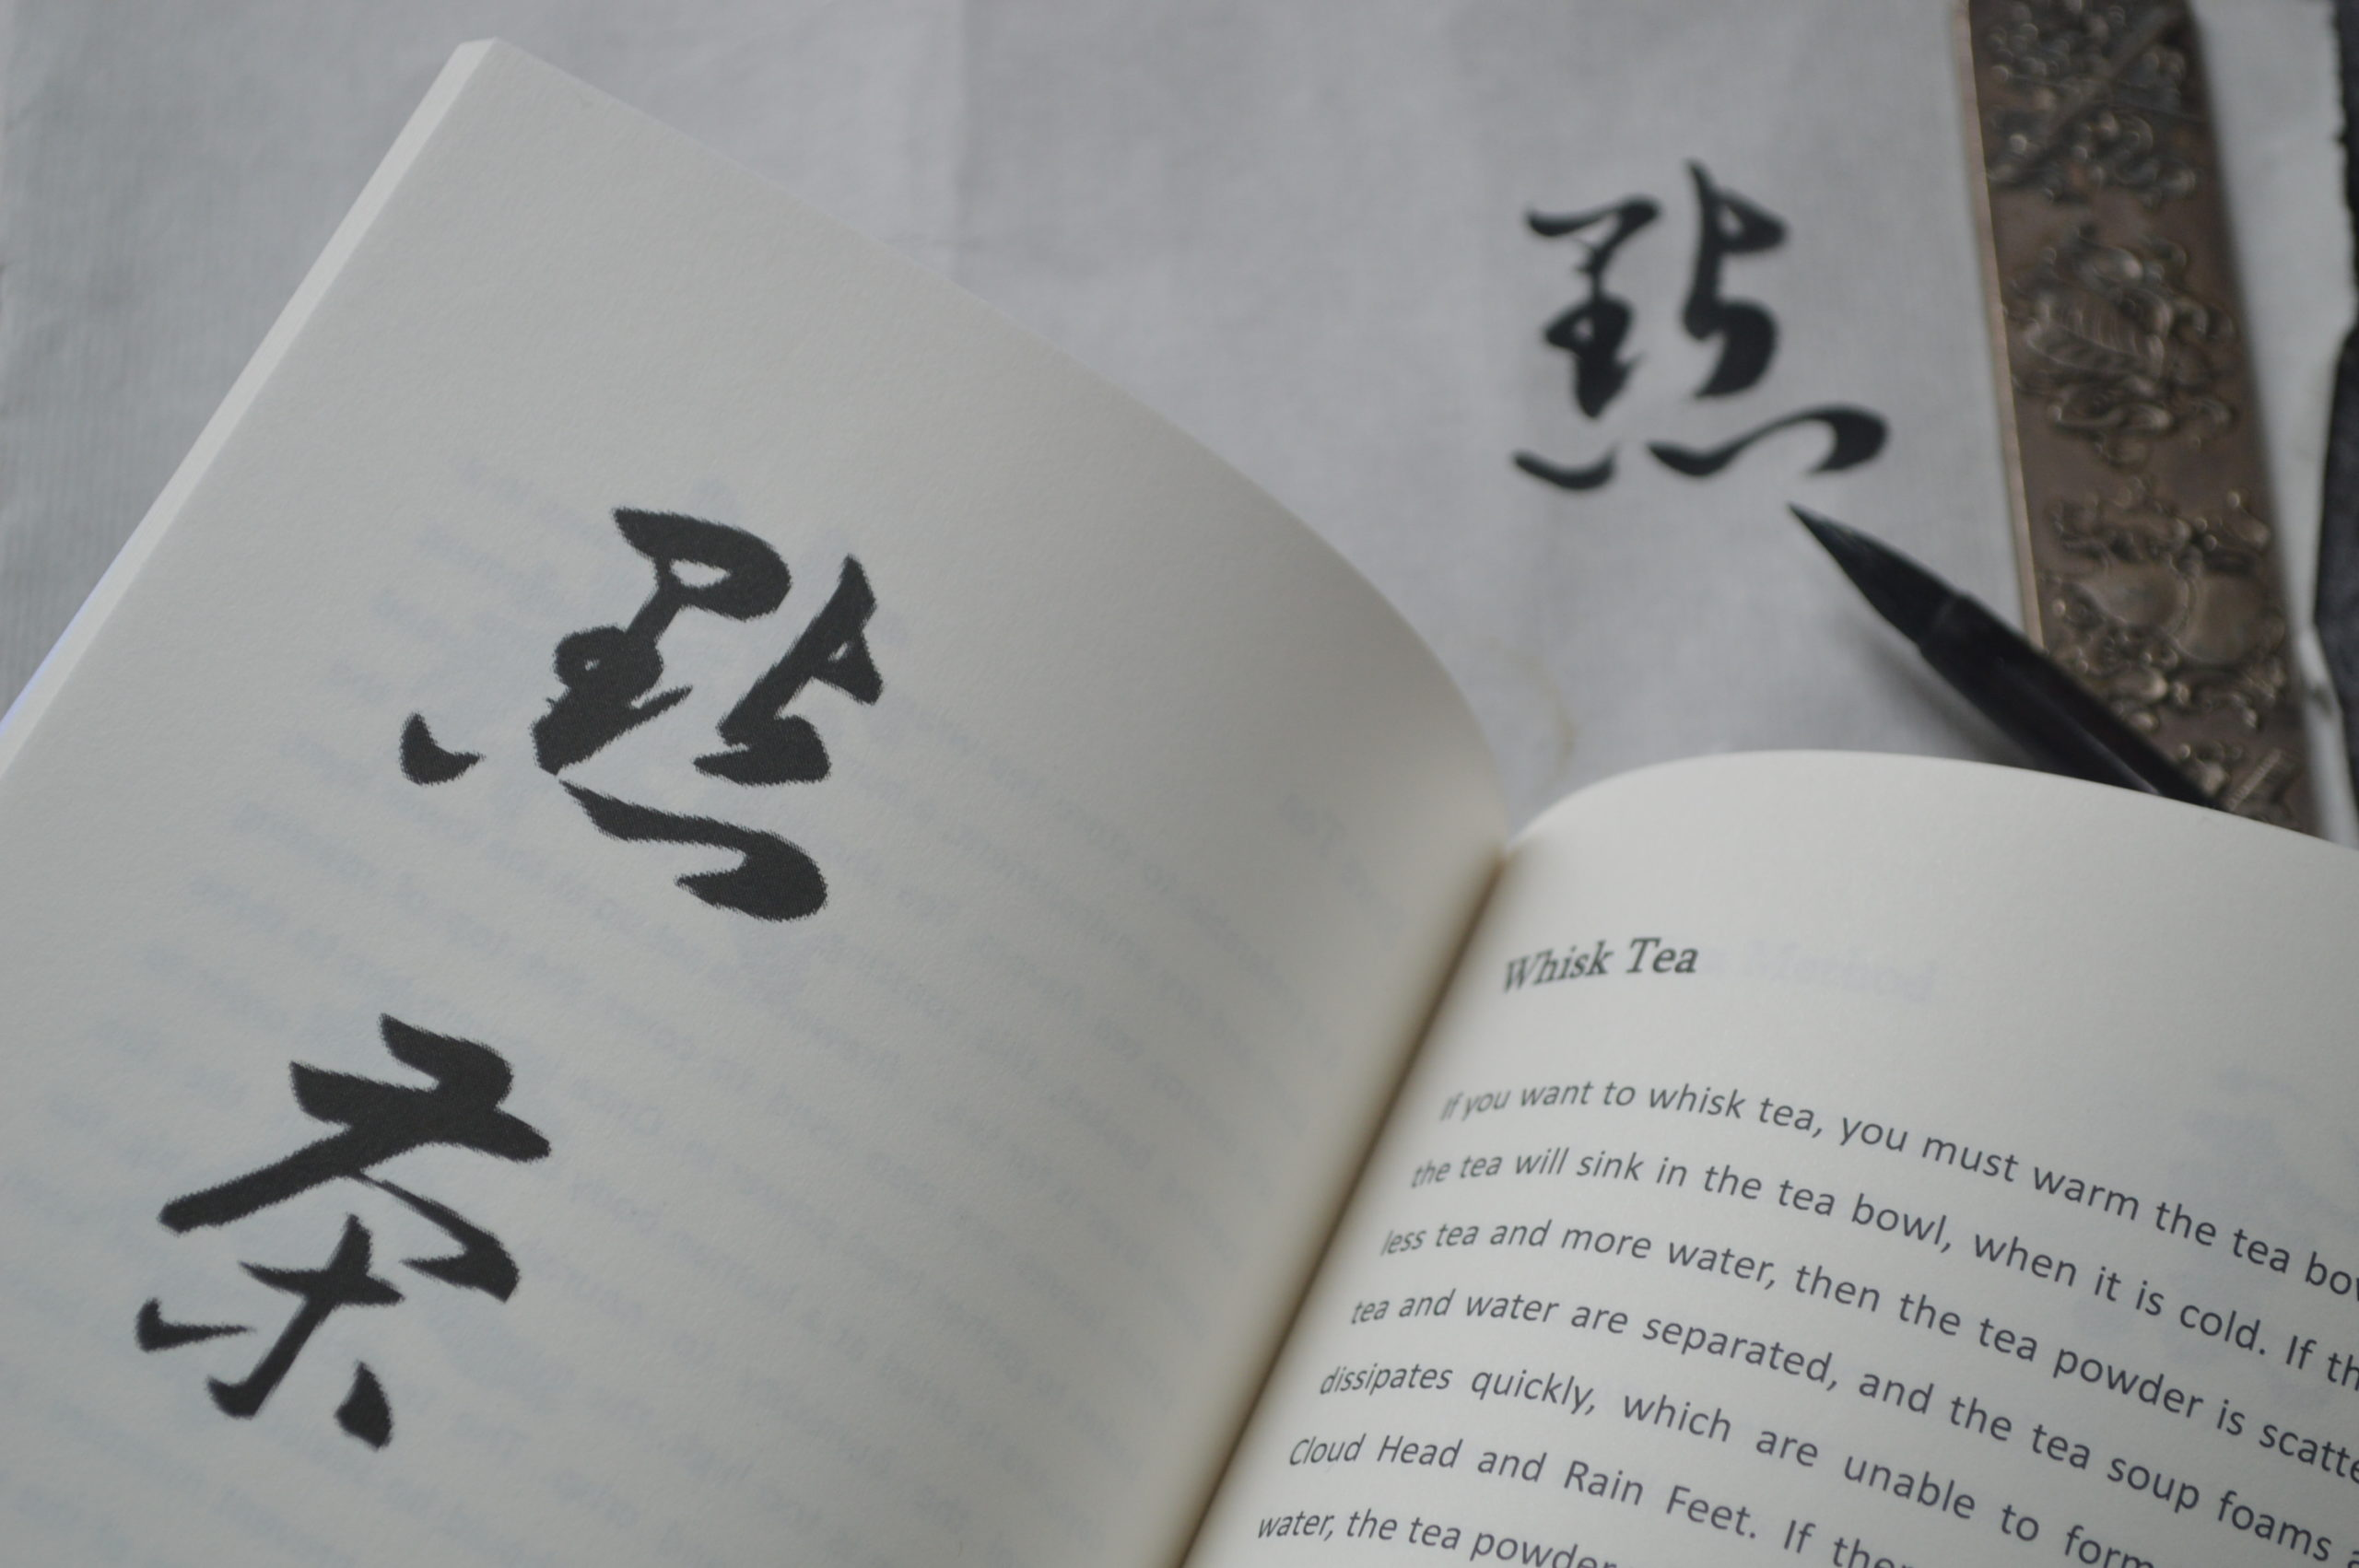 https://shop.liu-tea-art.com/wp-content/uploads/2020/05/DSC_0601-scaled.jpg